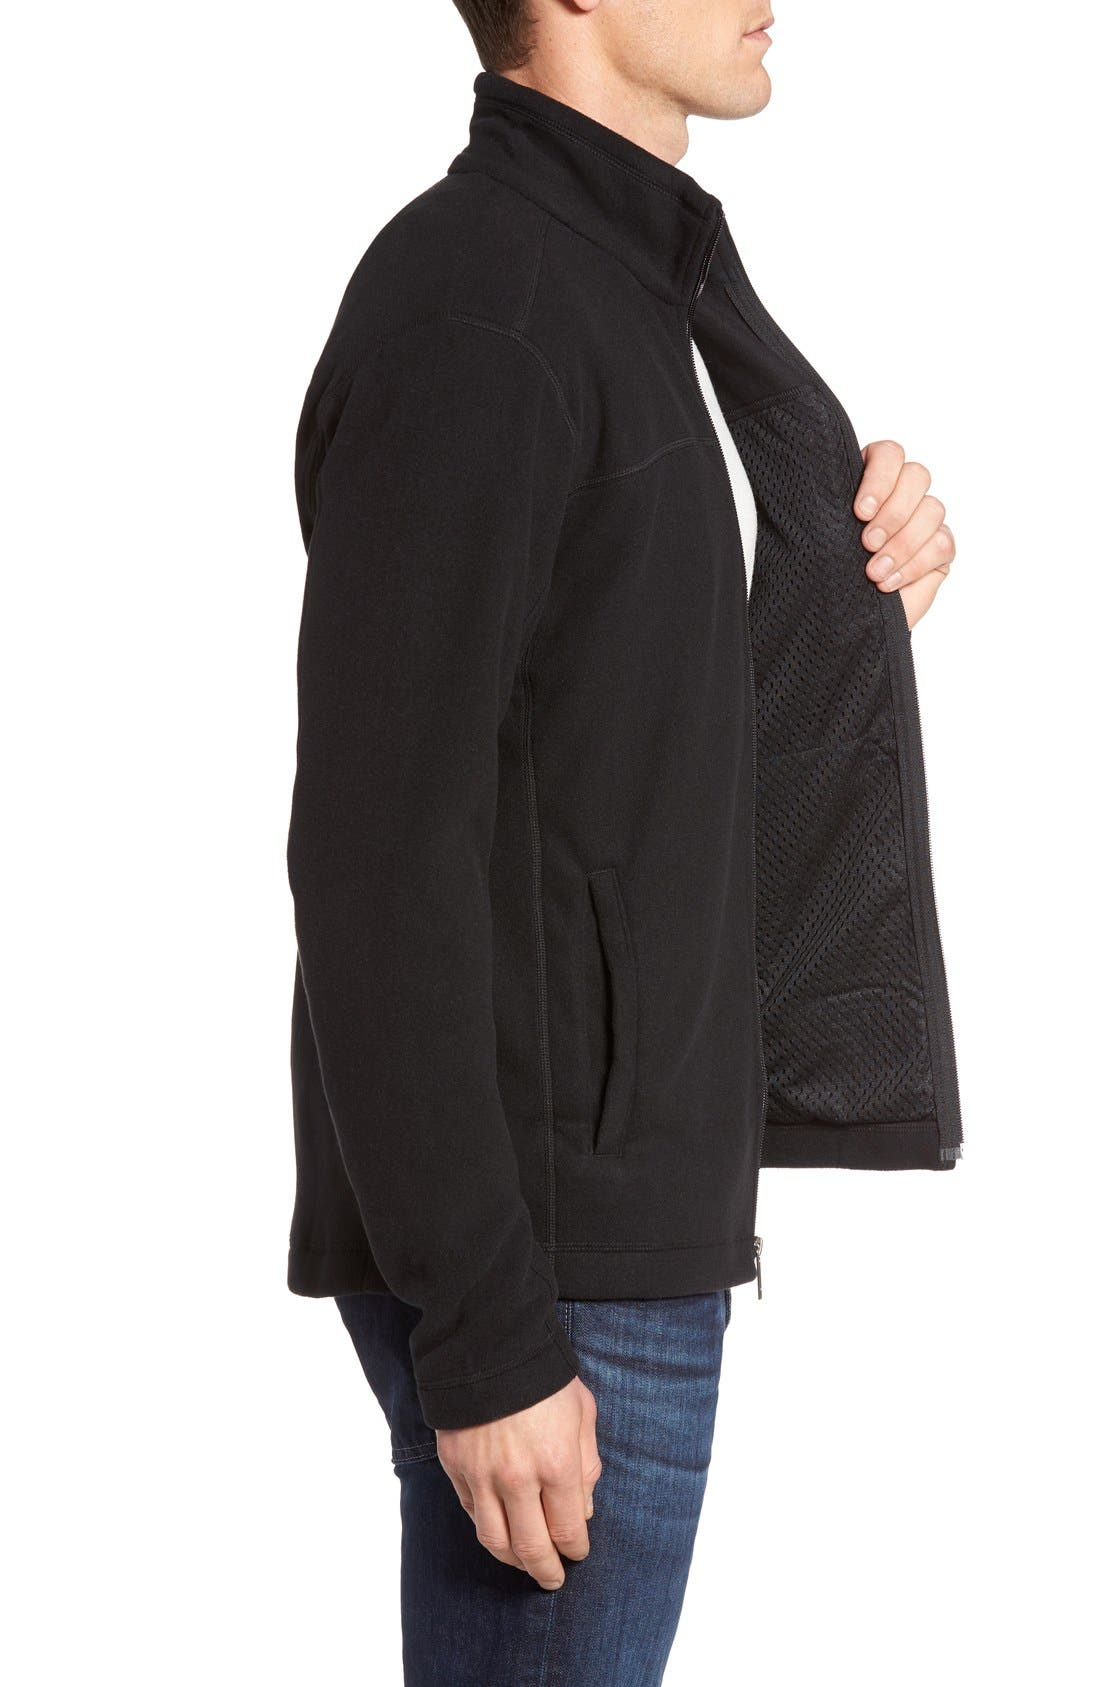 Micro D<sup>®</sup> Fleece Jacket,                             Alternate thumbnail 9, color,                             001